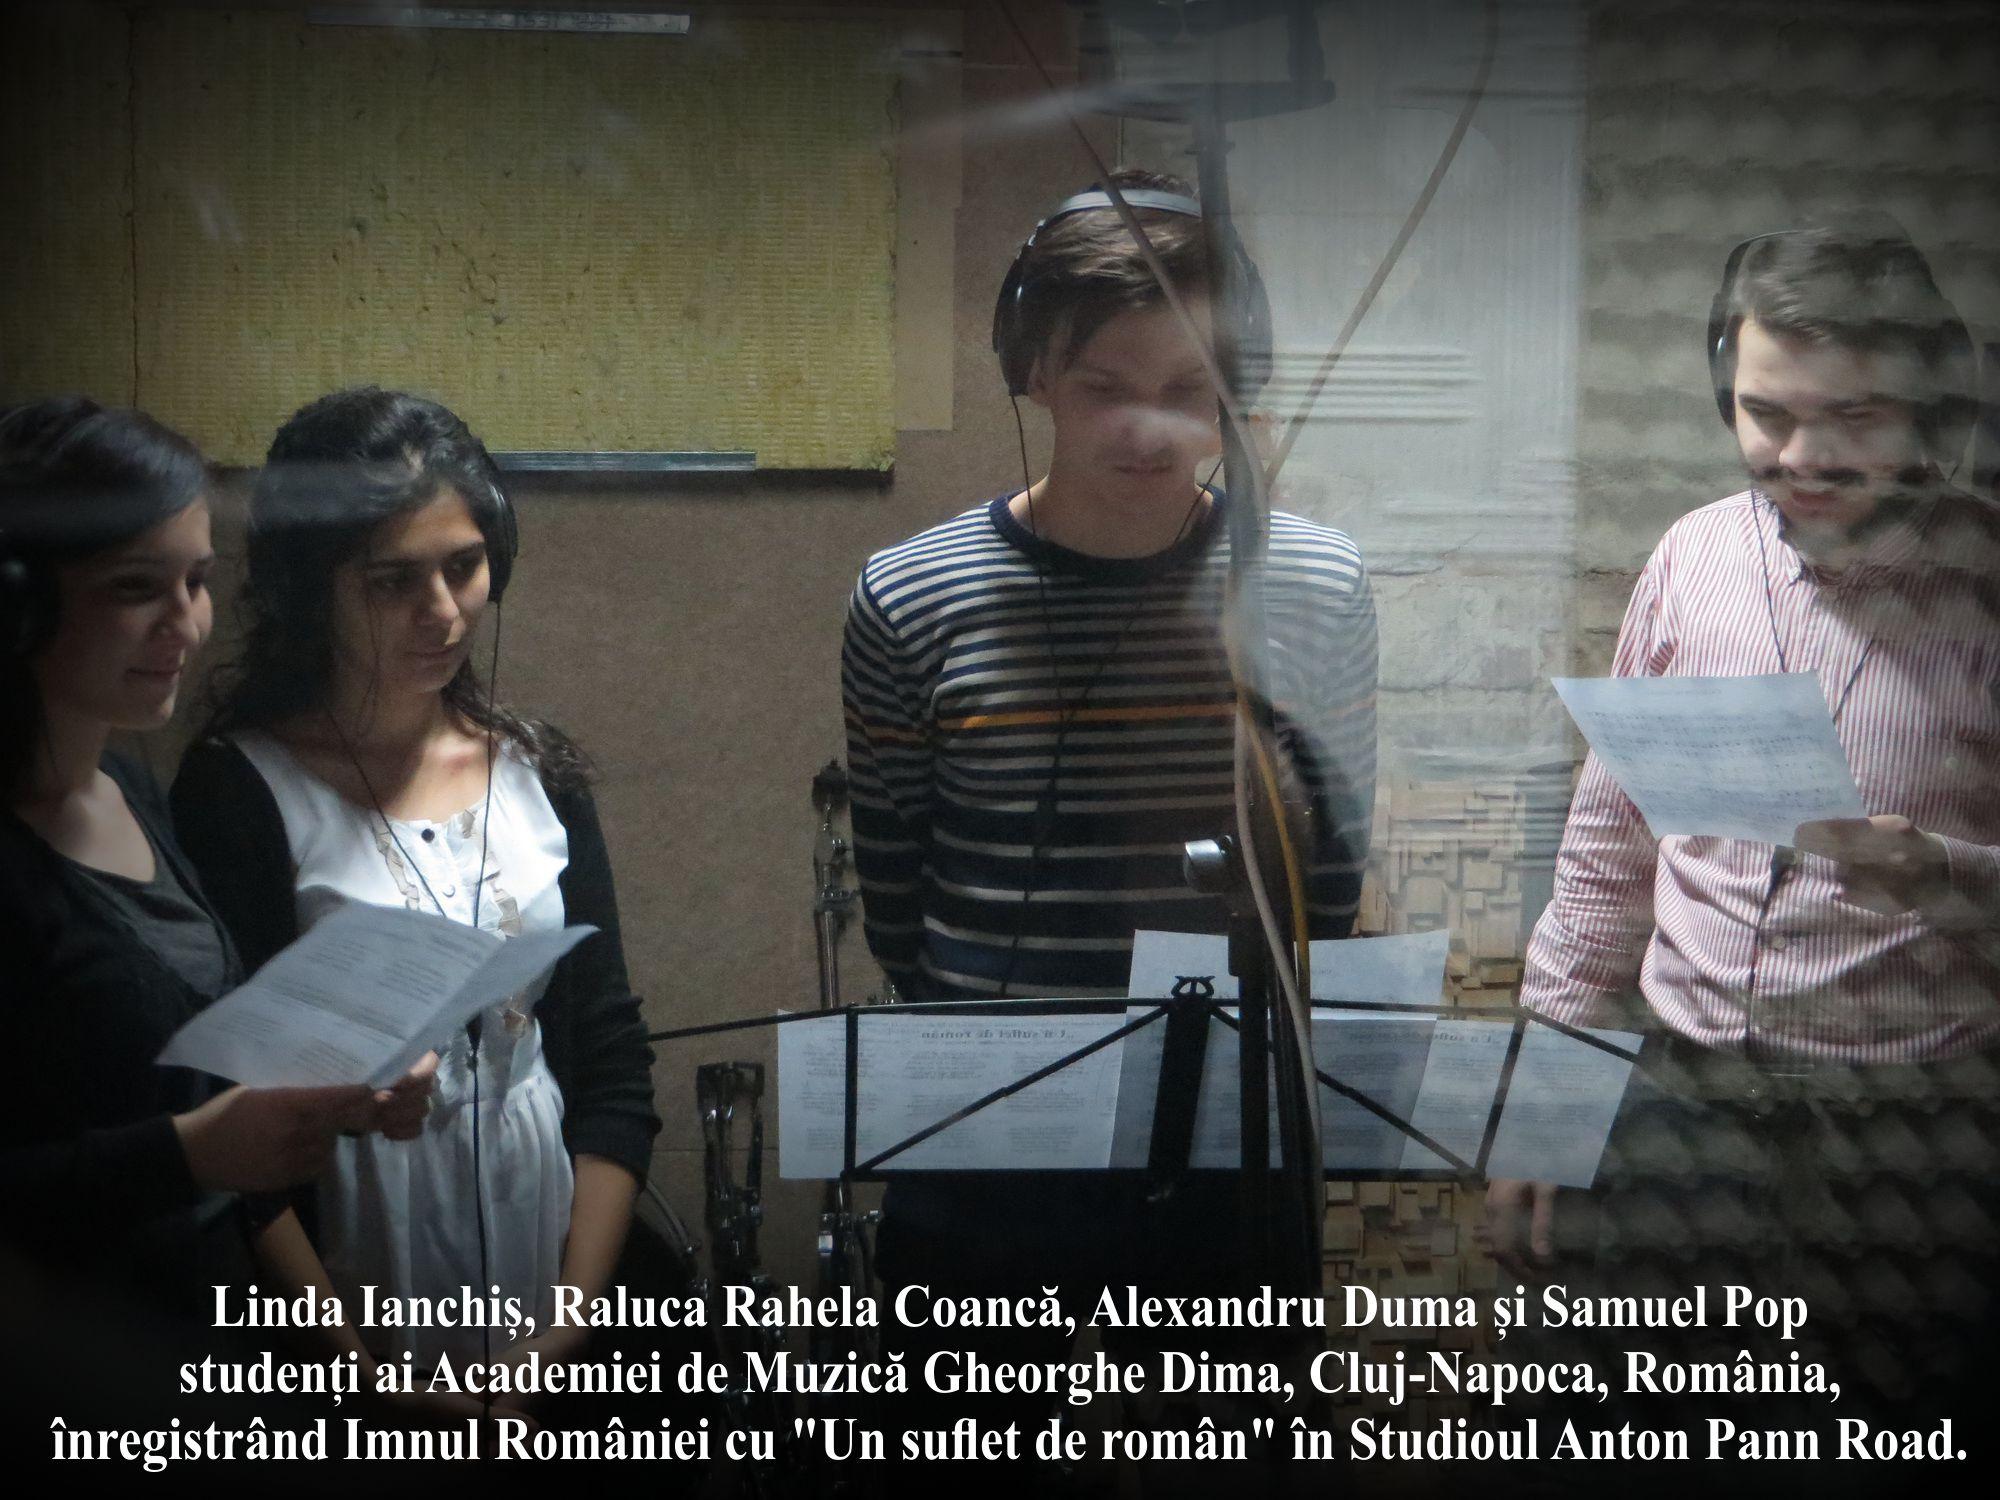 B- Linda - Rahela - Alexandru - Samuel recording Imnul National al Romaniei cu Un Suflet de Roman